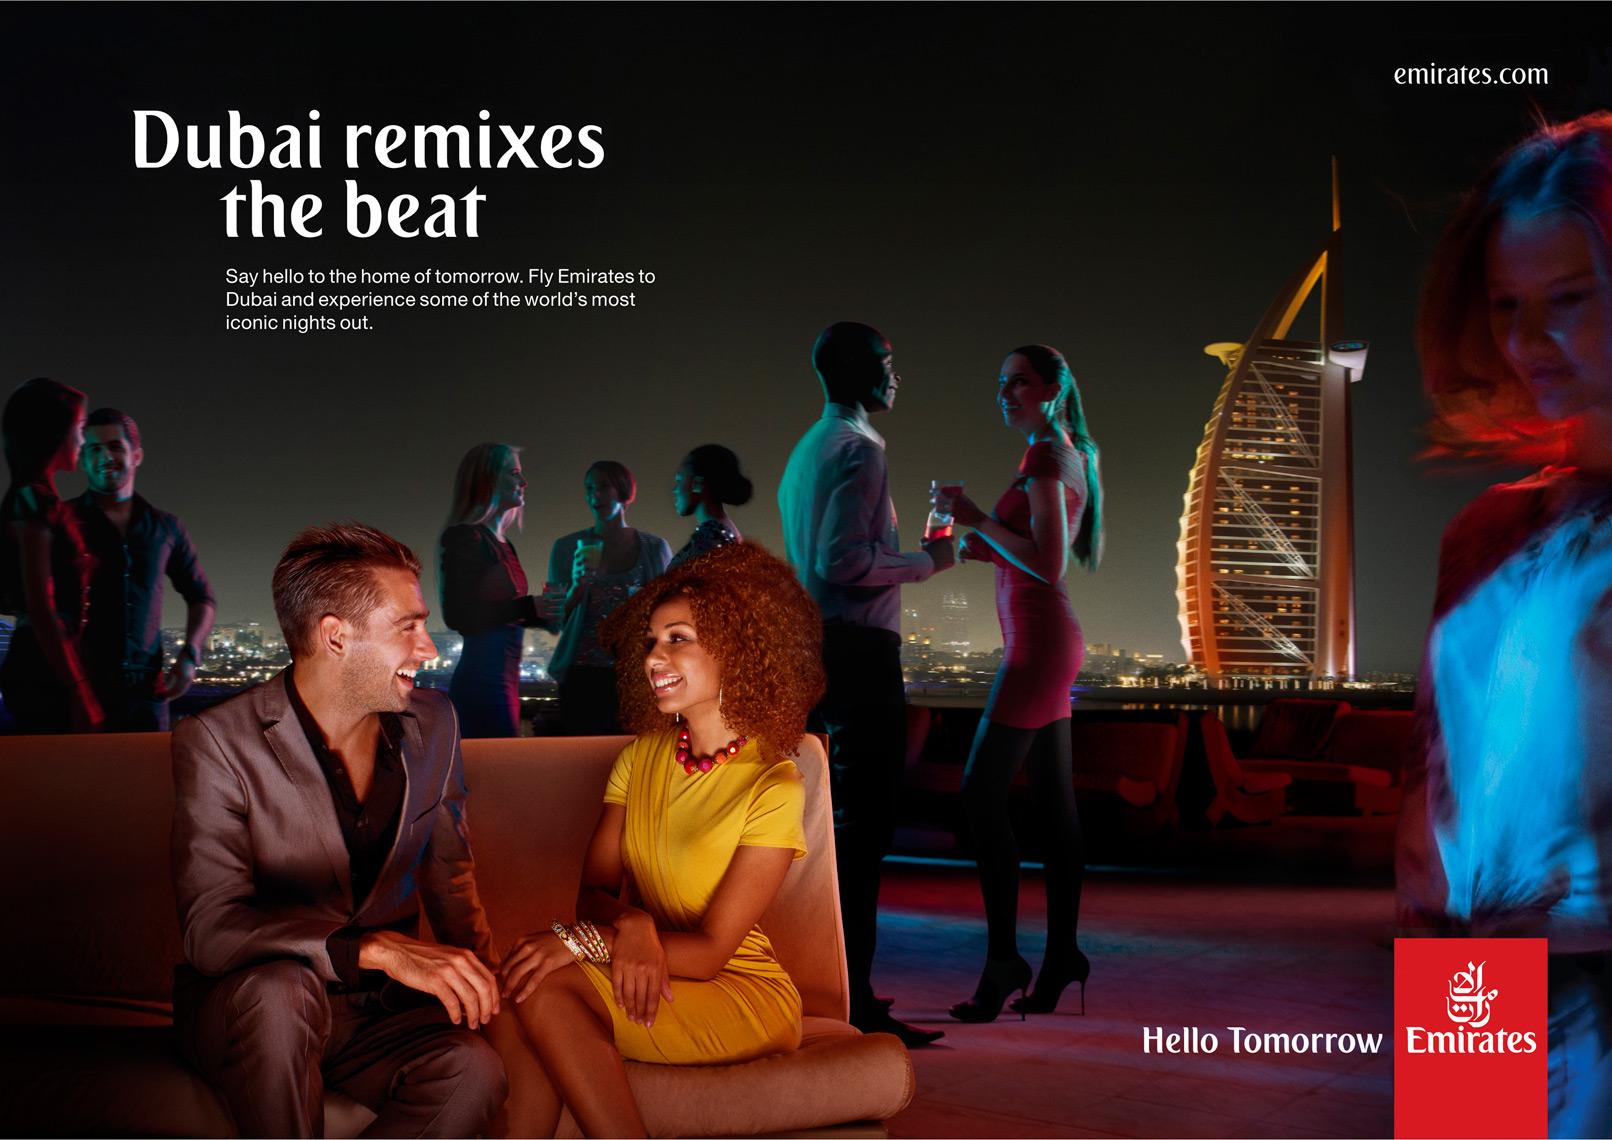 Emirates_360bar_ad_aug_2012